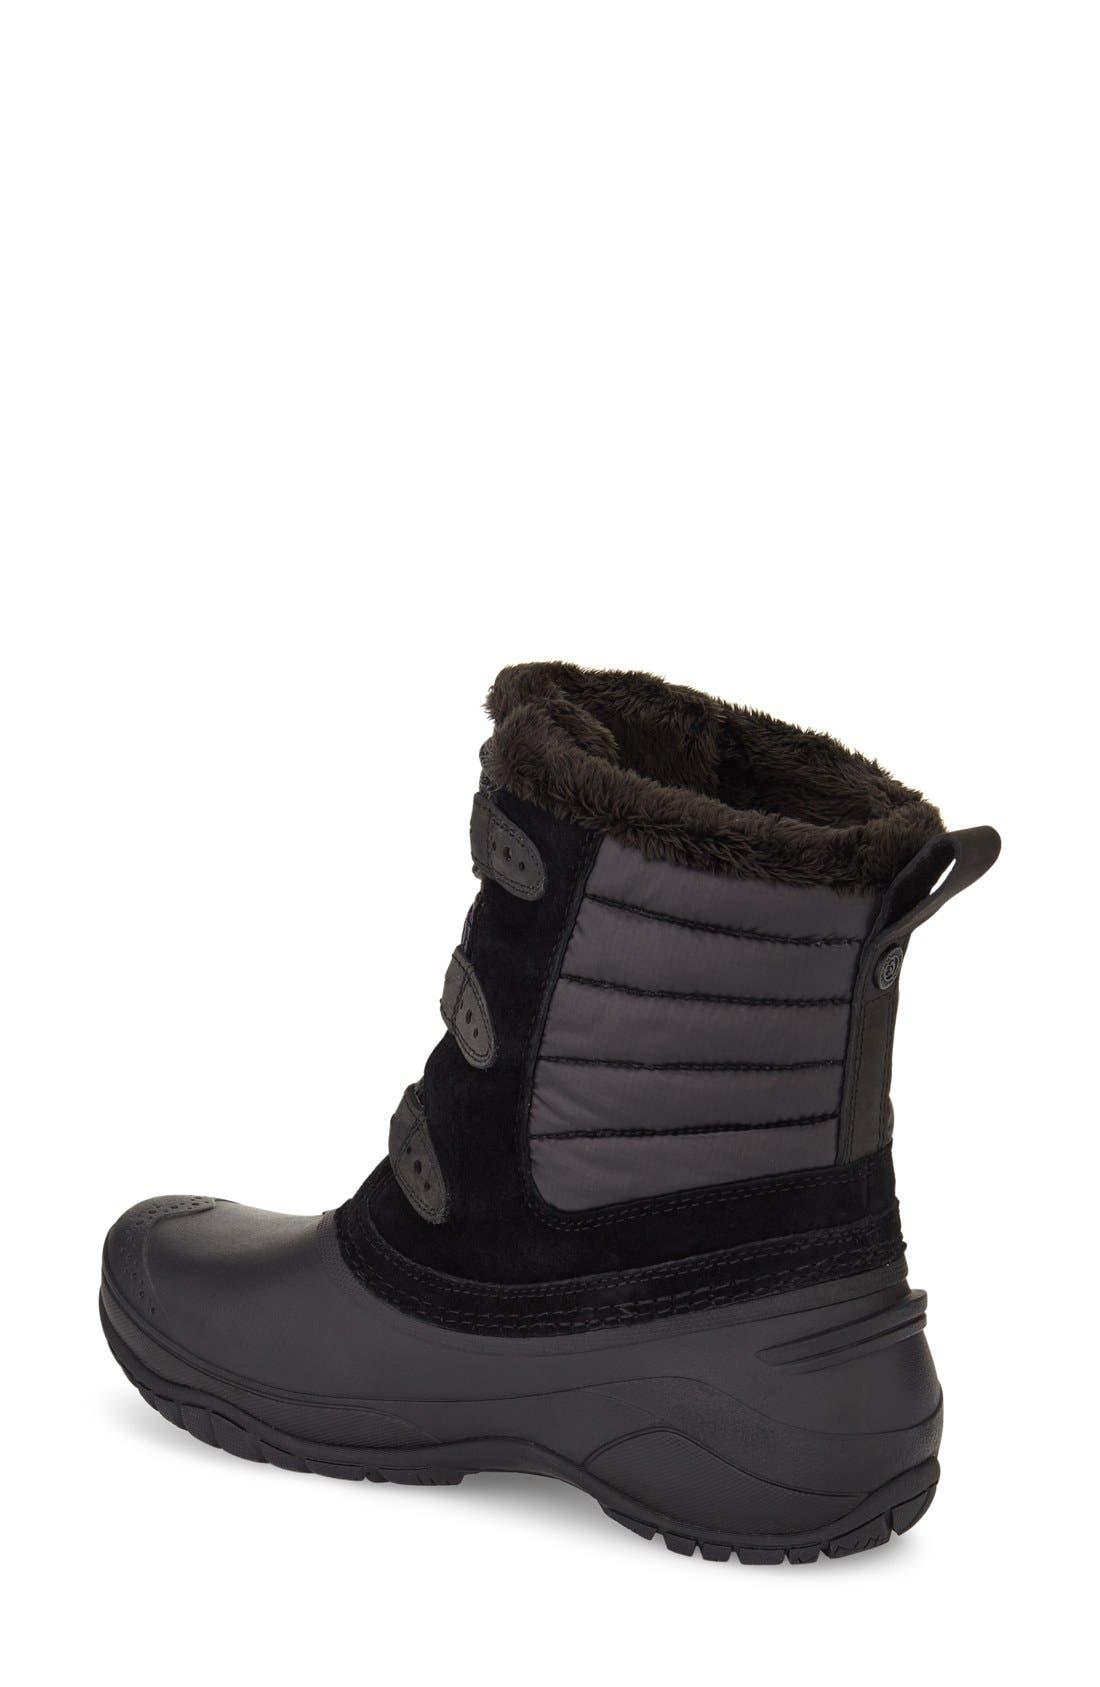 Shellista II Waterproof Boot,                             Alternate thumbnail 2, color,                             BLACK/ SMOKED PEARL GREY